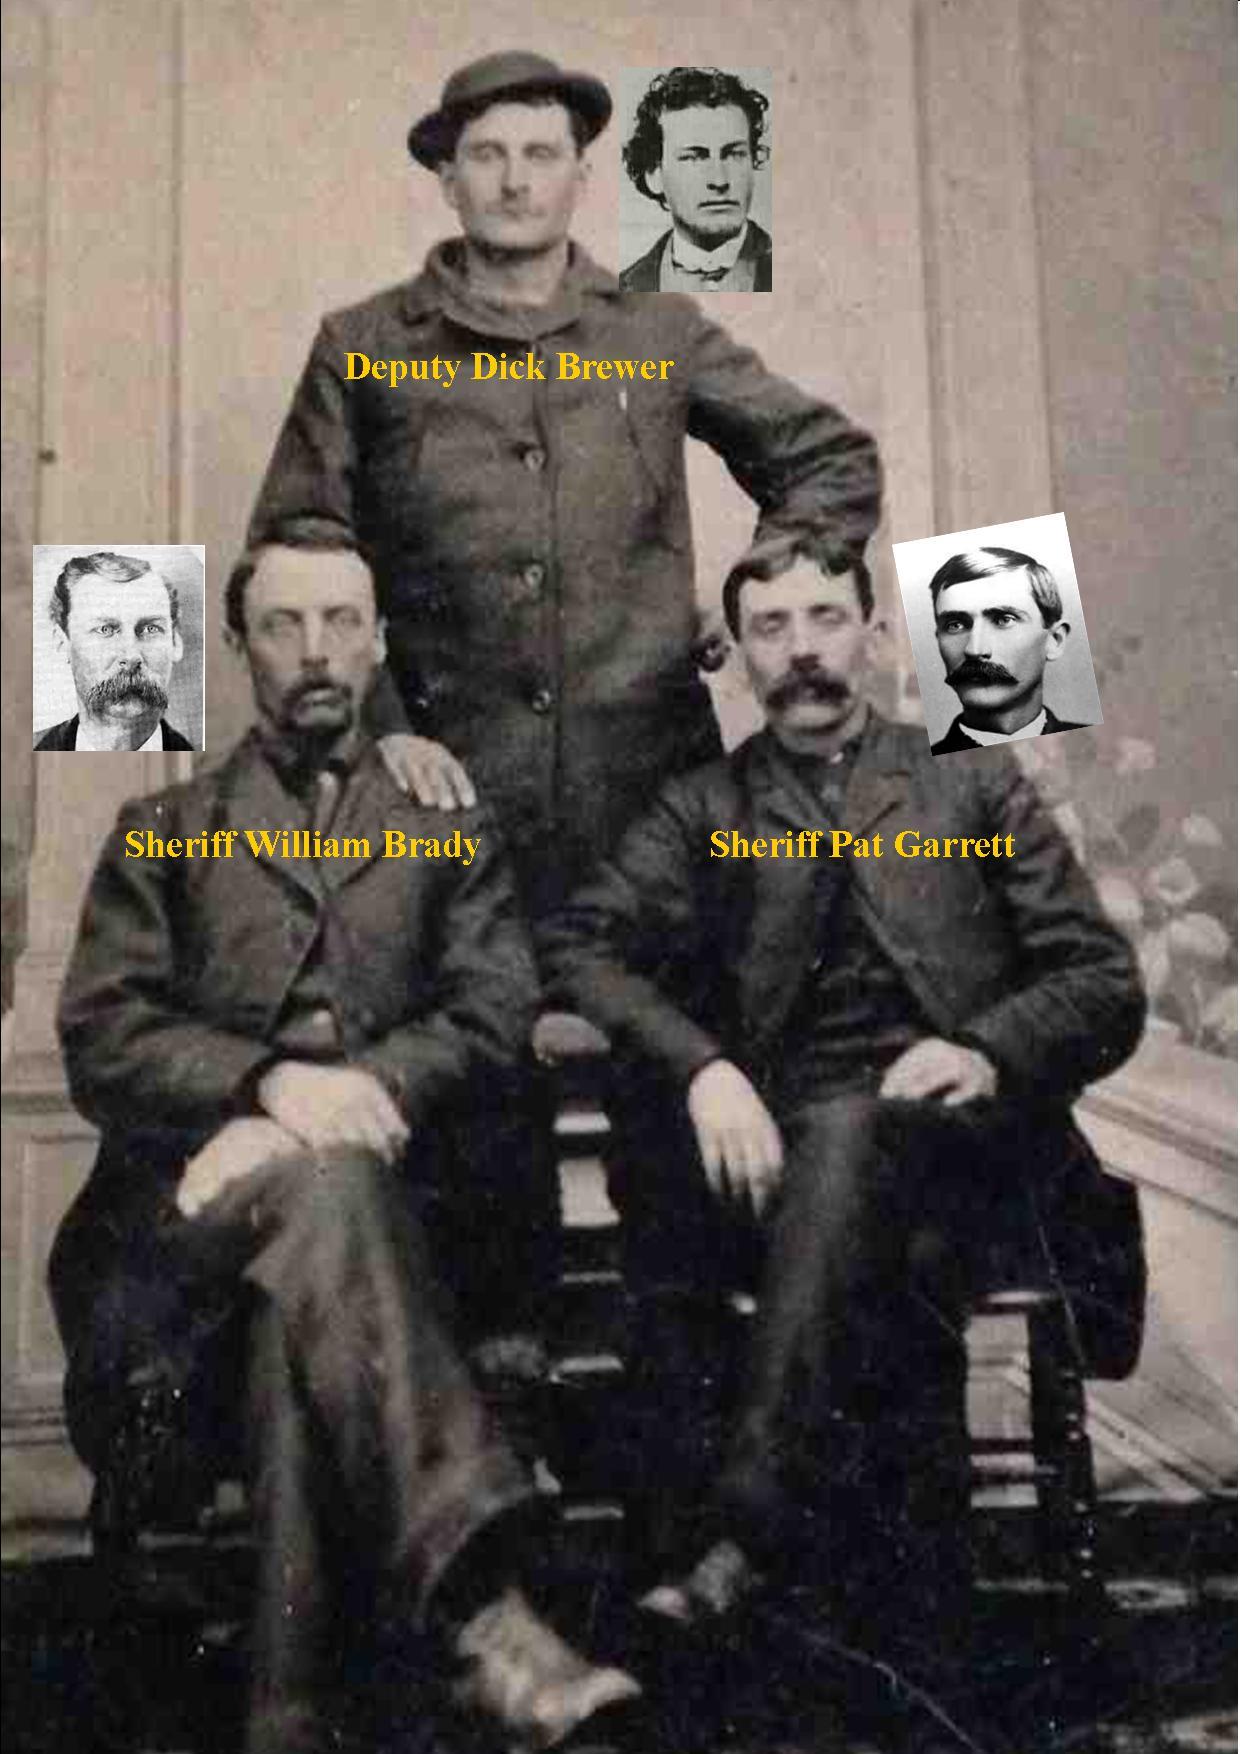 Sheriff Brady (left) Sheriff Garrett (right) Deputy Brewer (rear) / RJ Pastore Collection